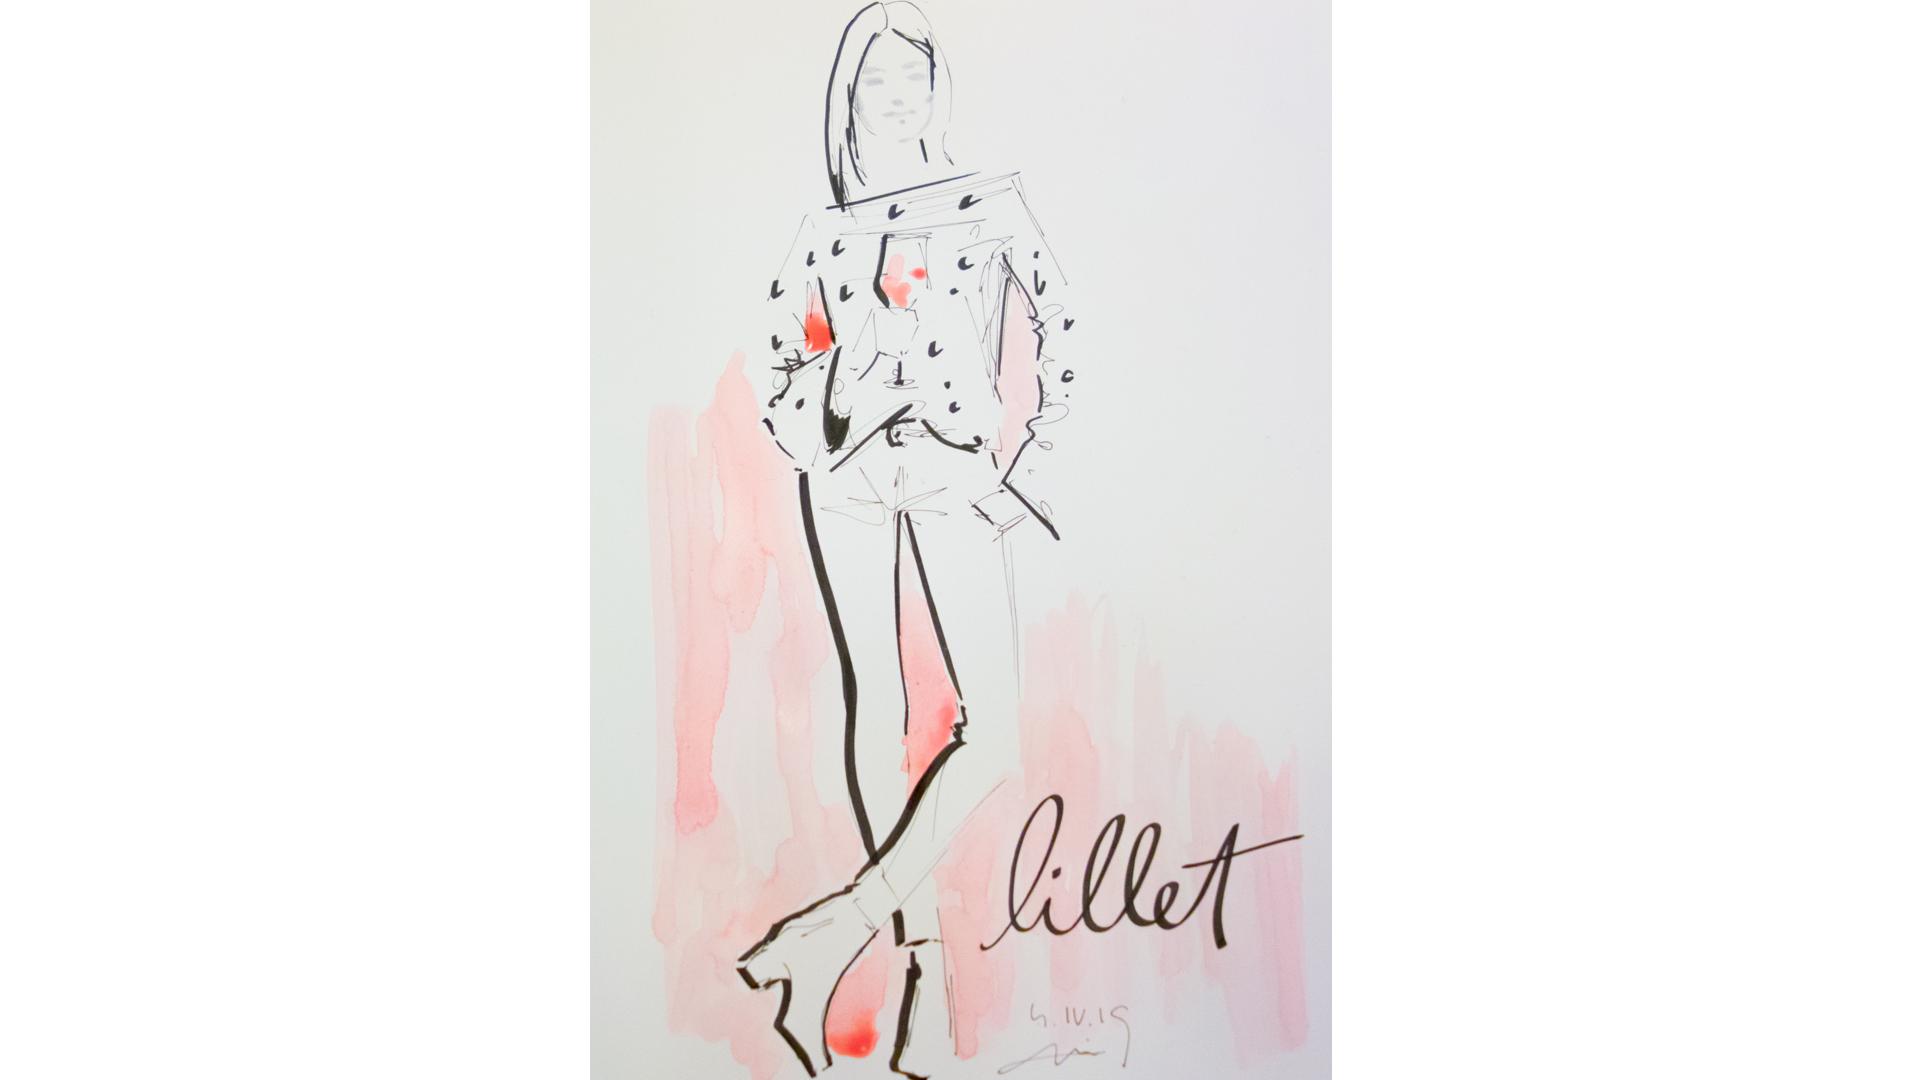 Live-Sketching-Fashion-Illustration-Event-Lillet-Virginia-Romo-3.jpg